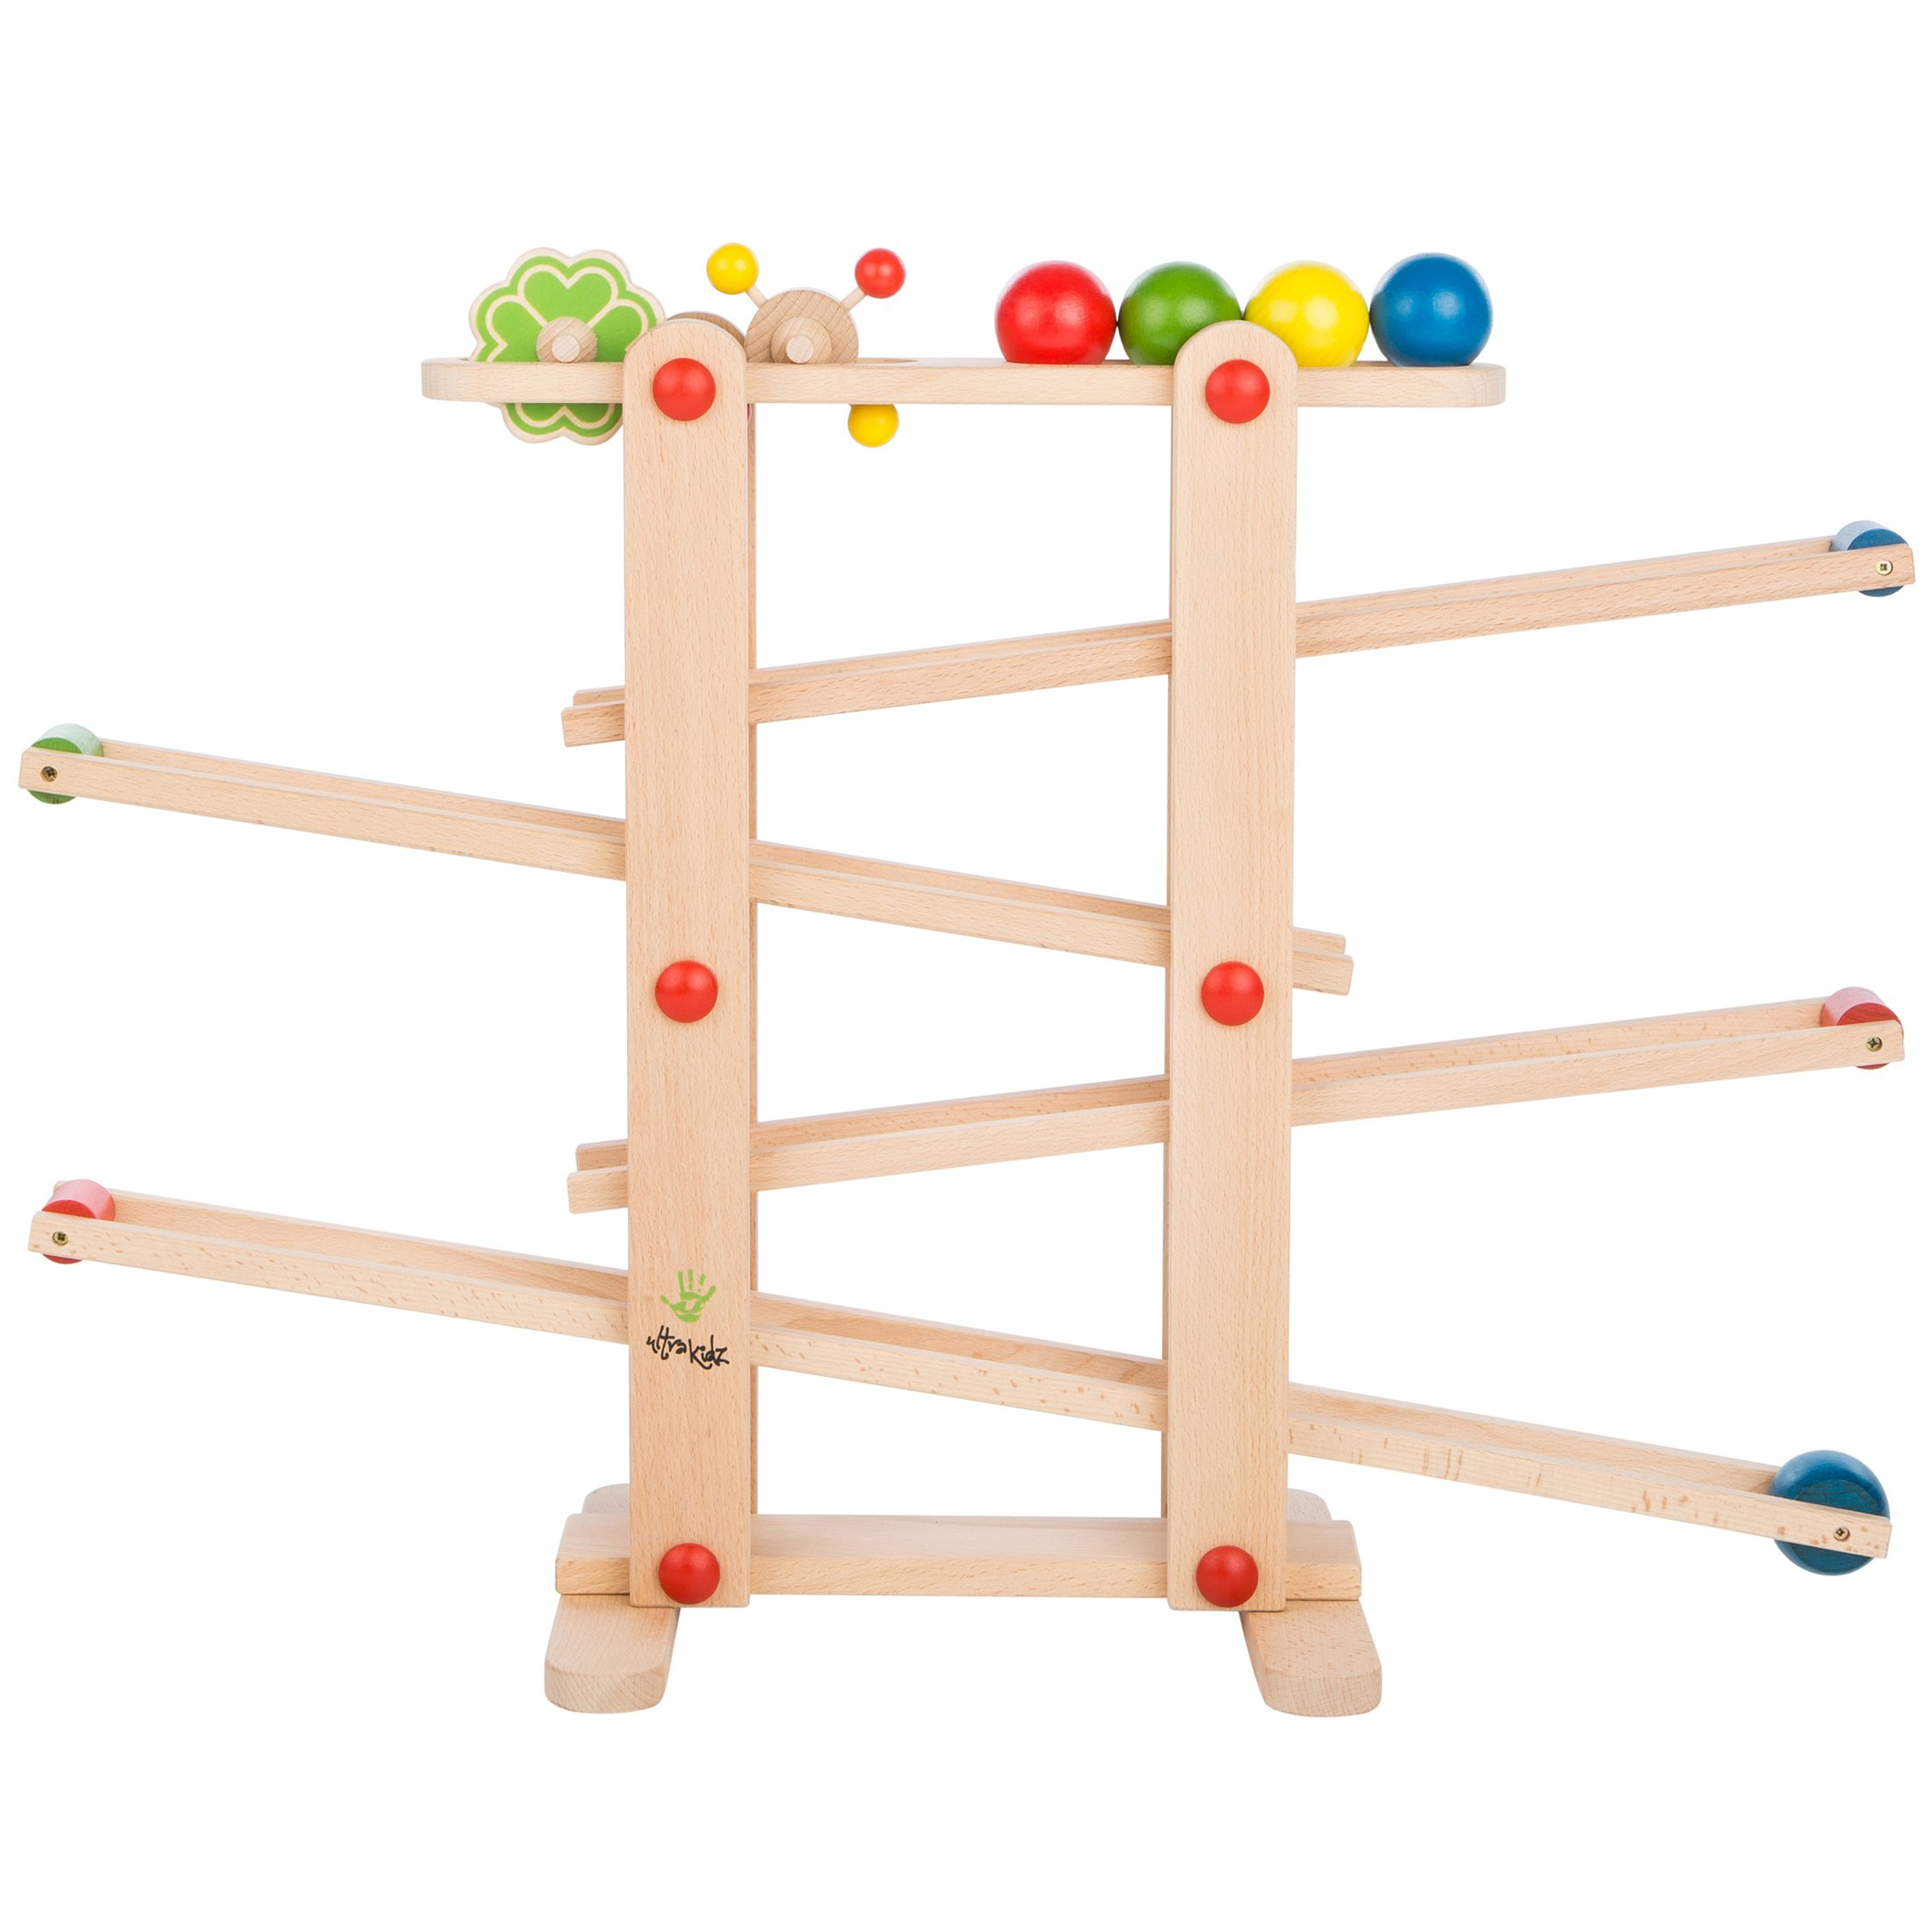 Ultrakidz Natural Wood Ball Run Schwubs with 4 balls and rolling toys